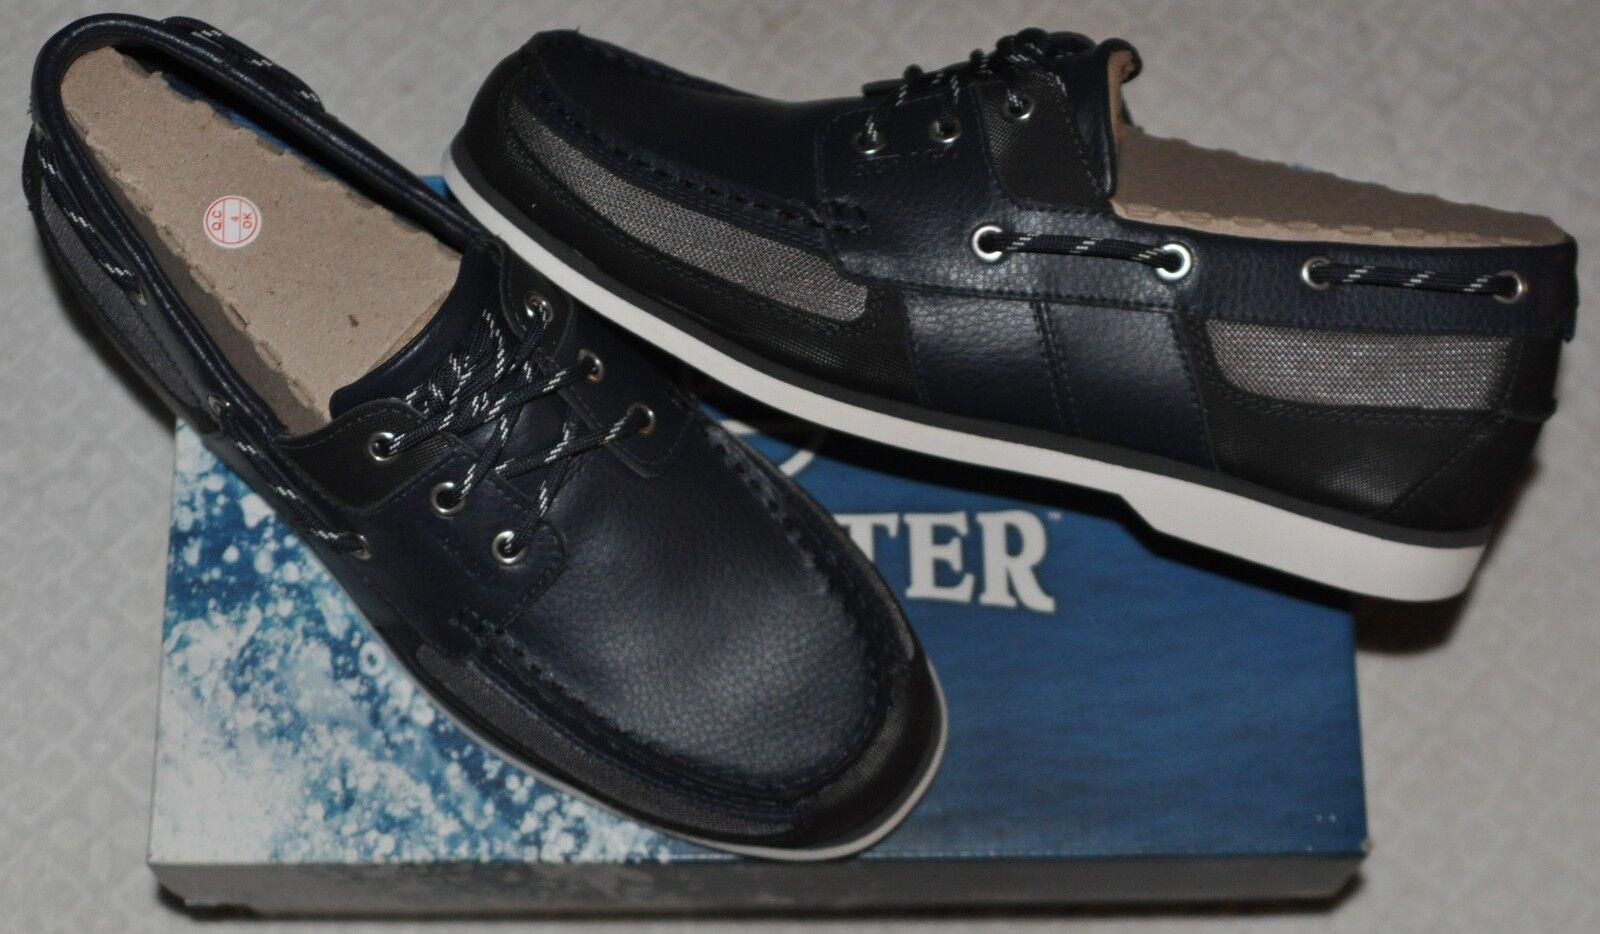 Sebago Crest Vent barco de zapatos talla 12 a estrenar con la Caja Original